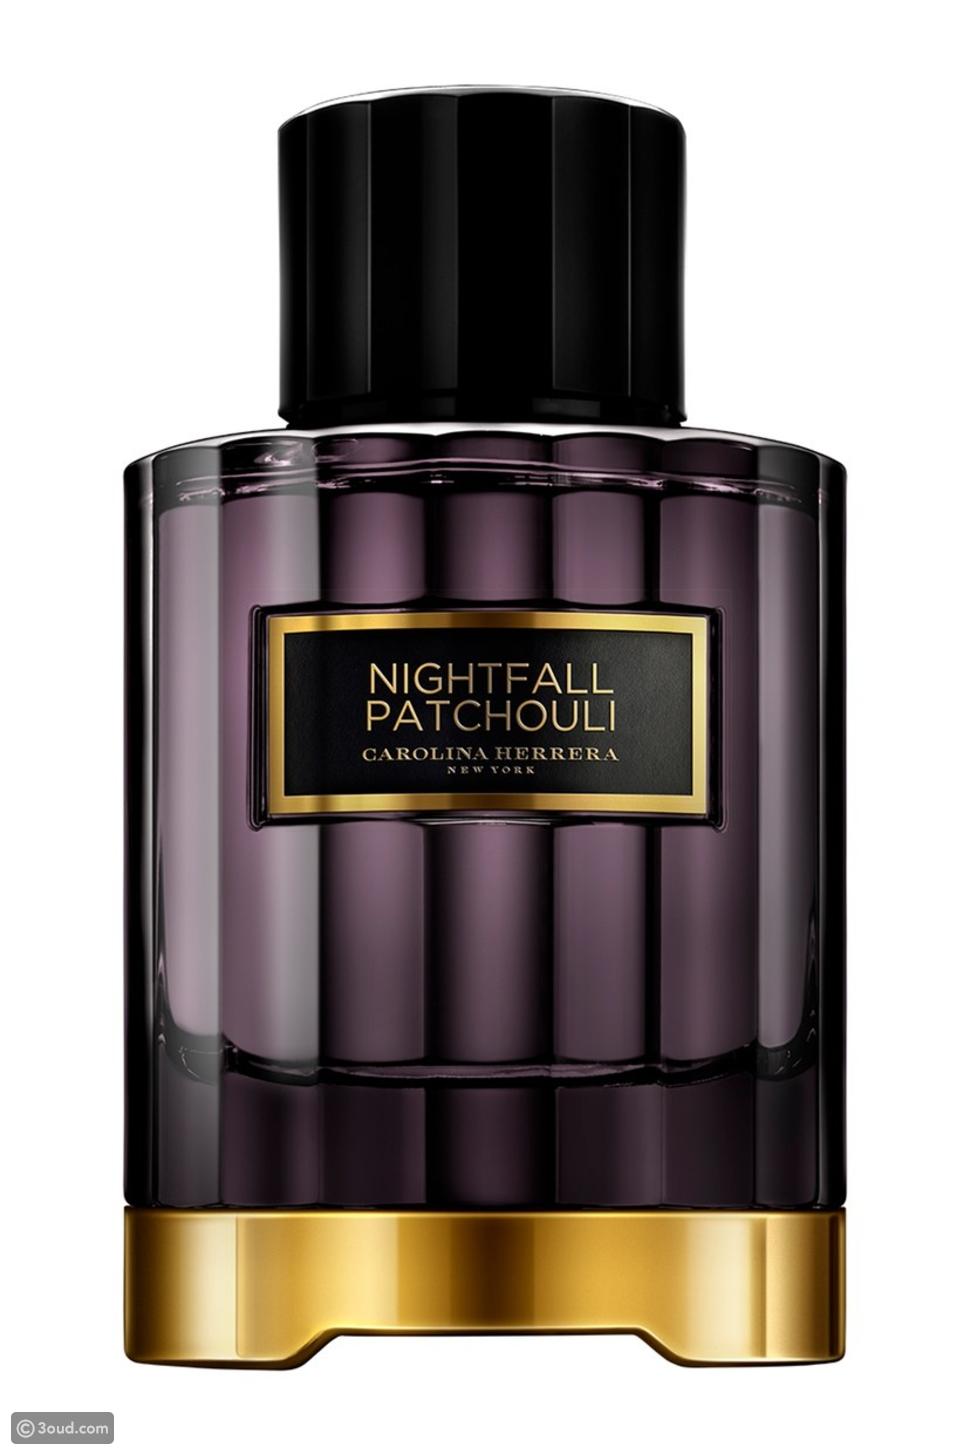 Carolina Herrera Confidential Nightfall Patchouli